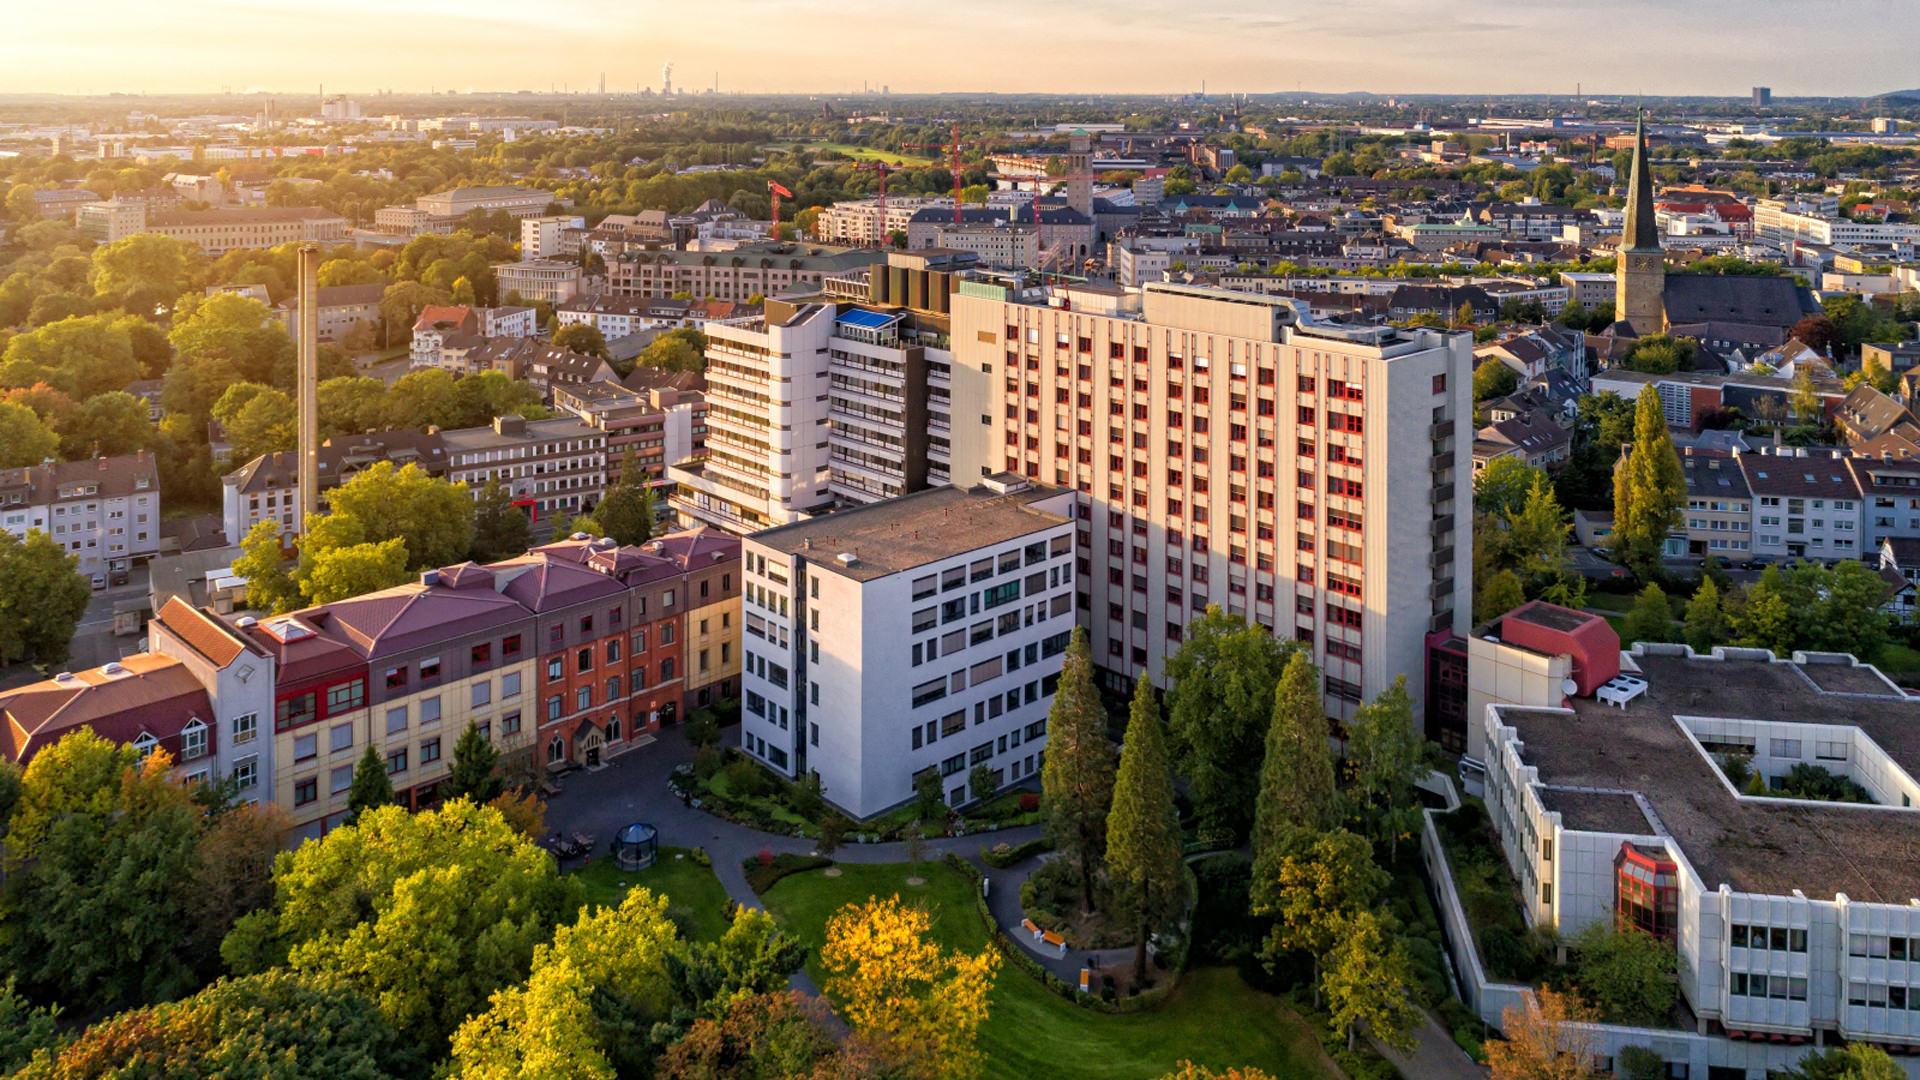 Ev. Krankenhaus Mülheim an der Ruhr